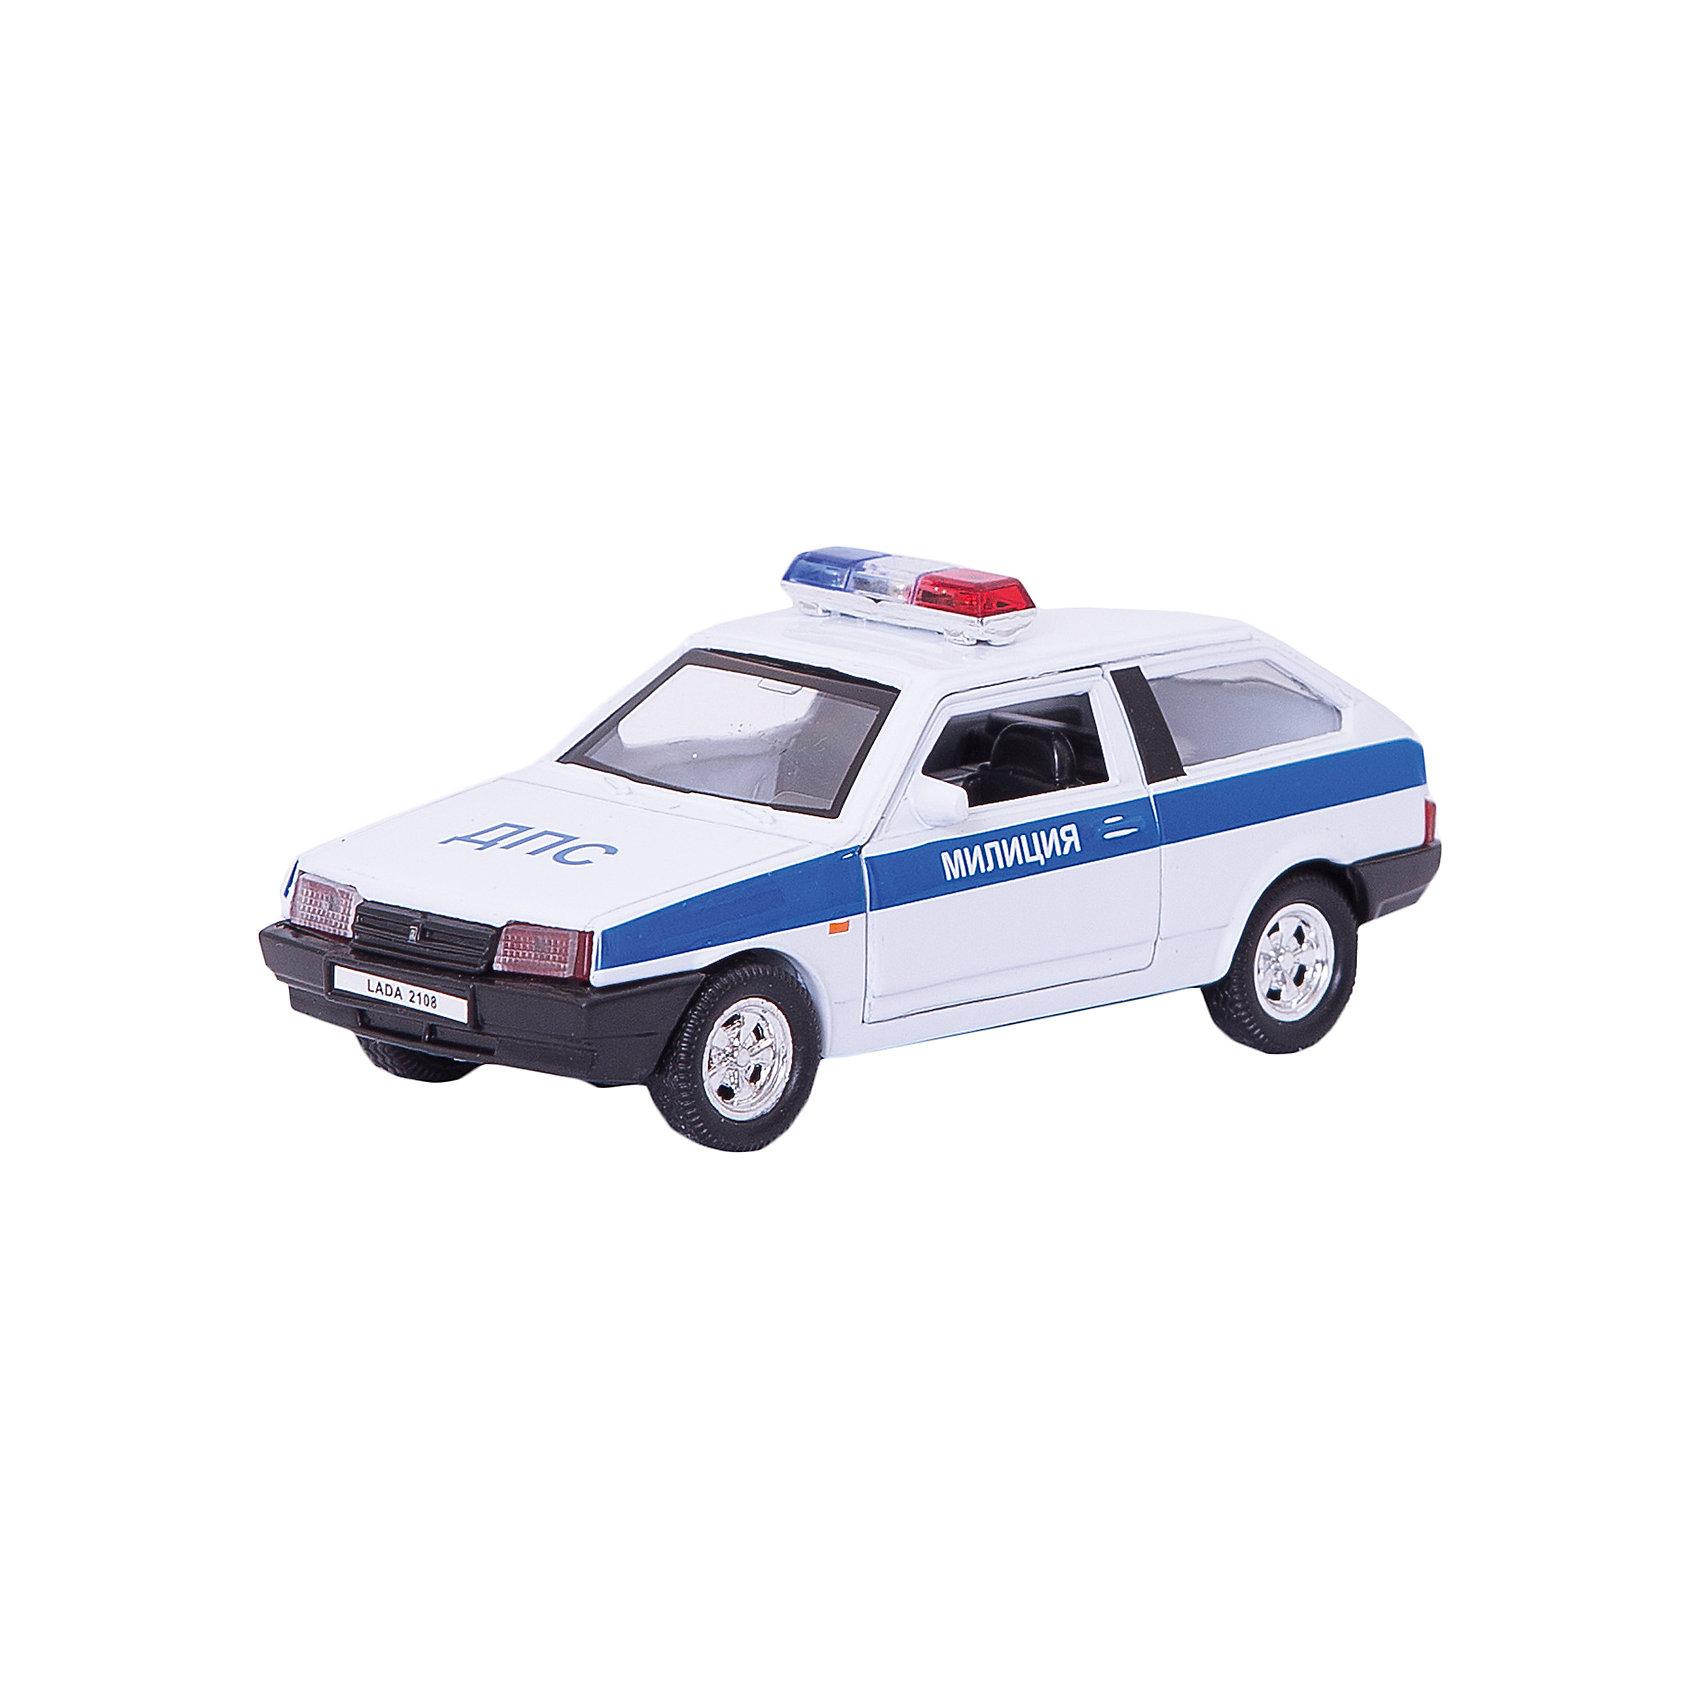 Welly Модель машины 1:34-39 LADA 2108 МИЛИЦИЯ ДПС., Welly автомобиль welly lada 2108 rally 1 34 39 белый